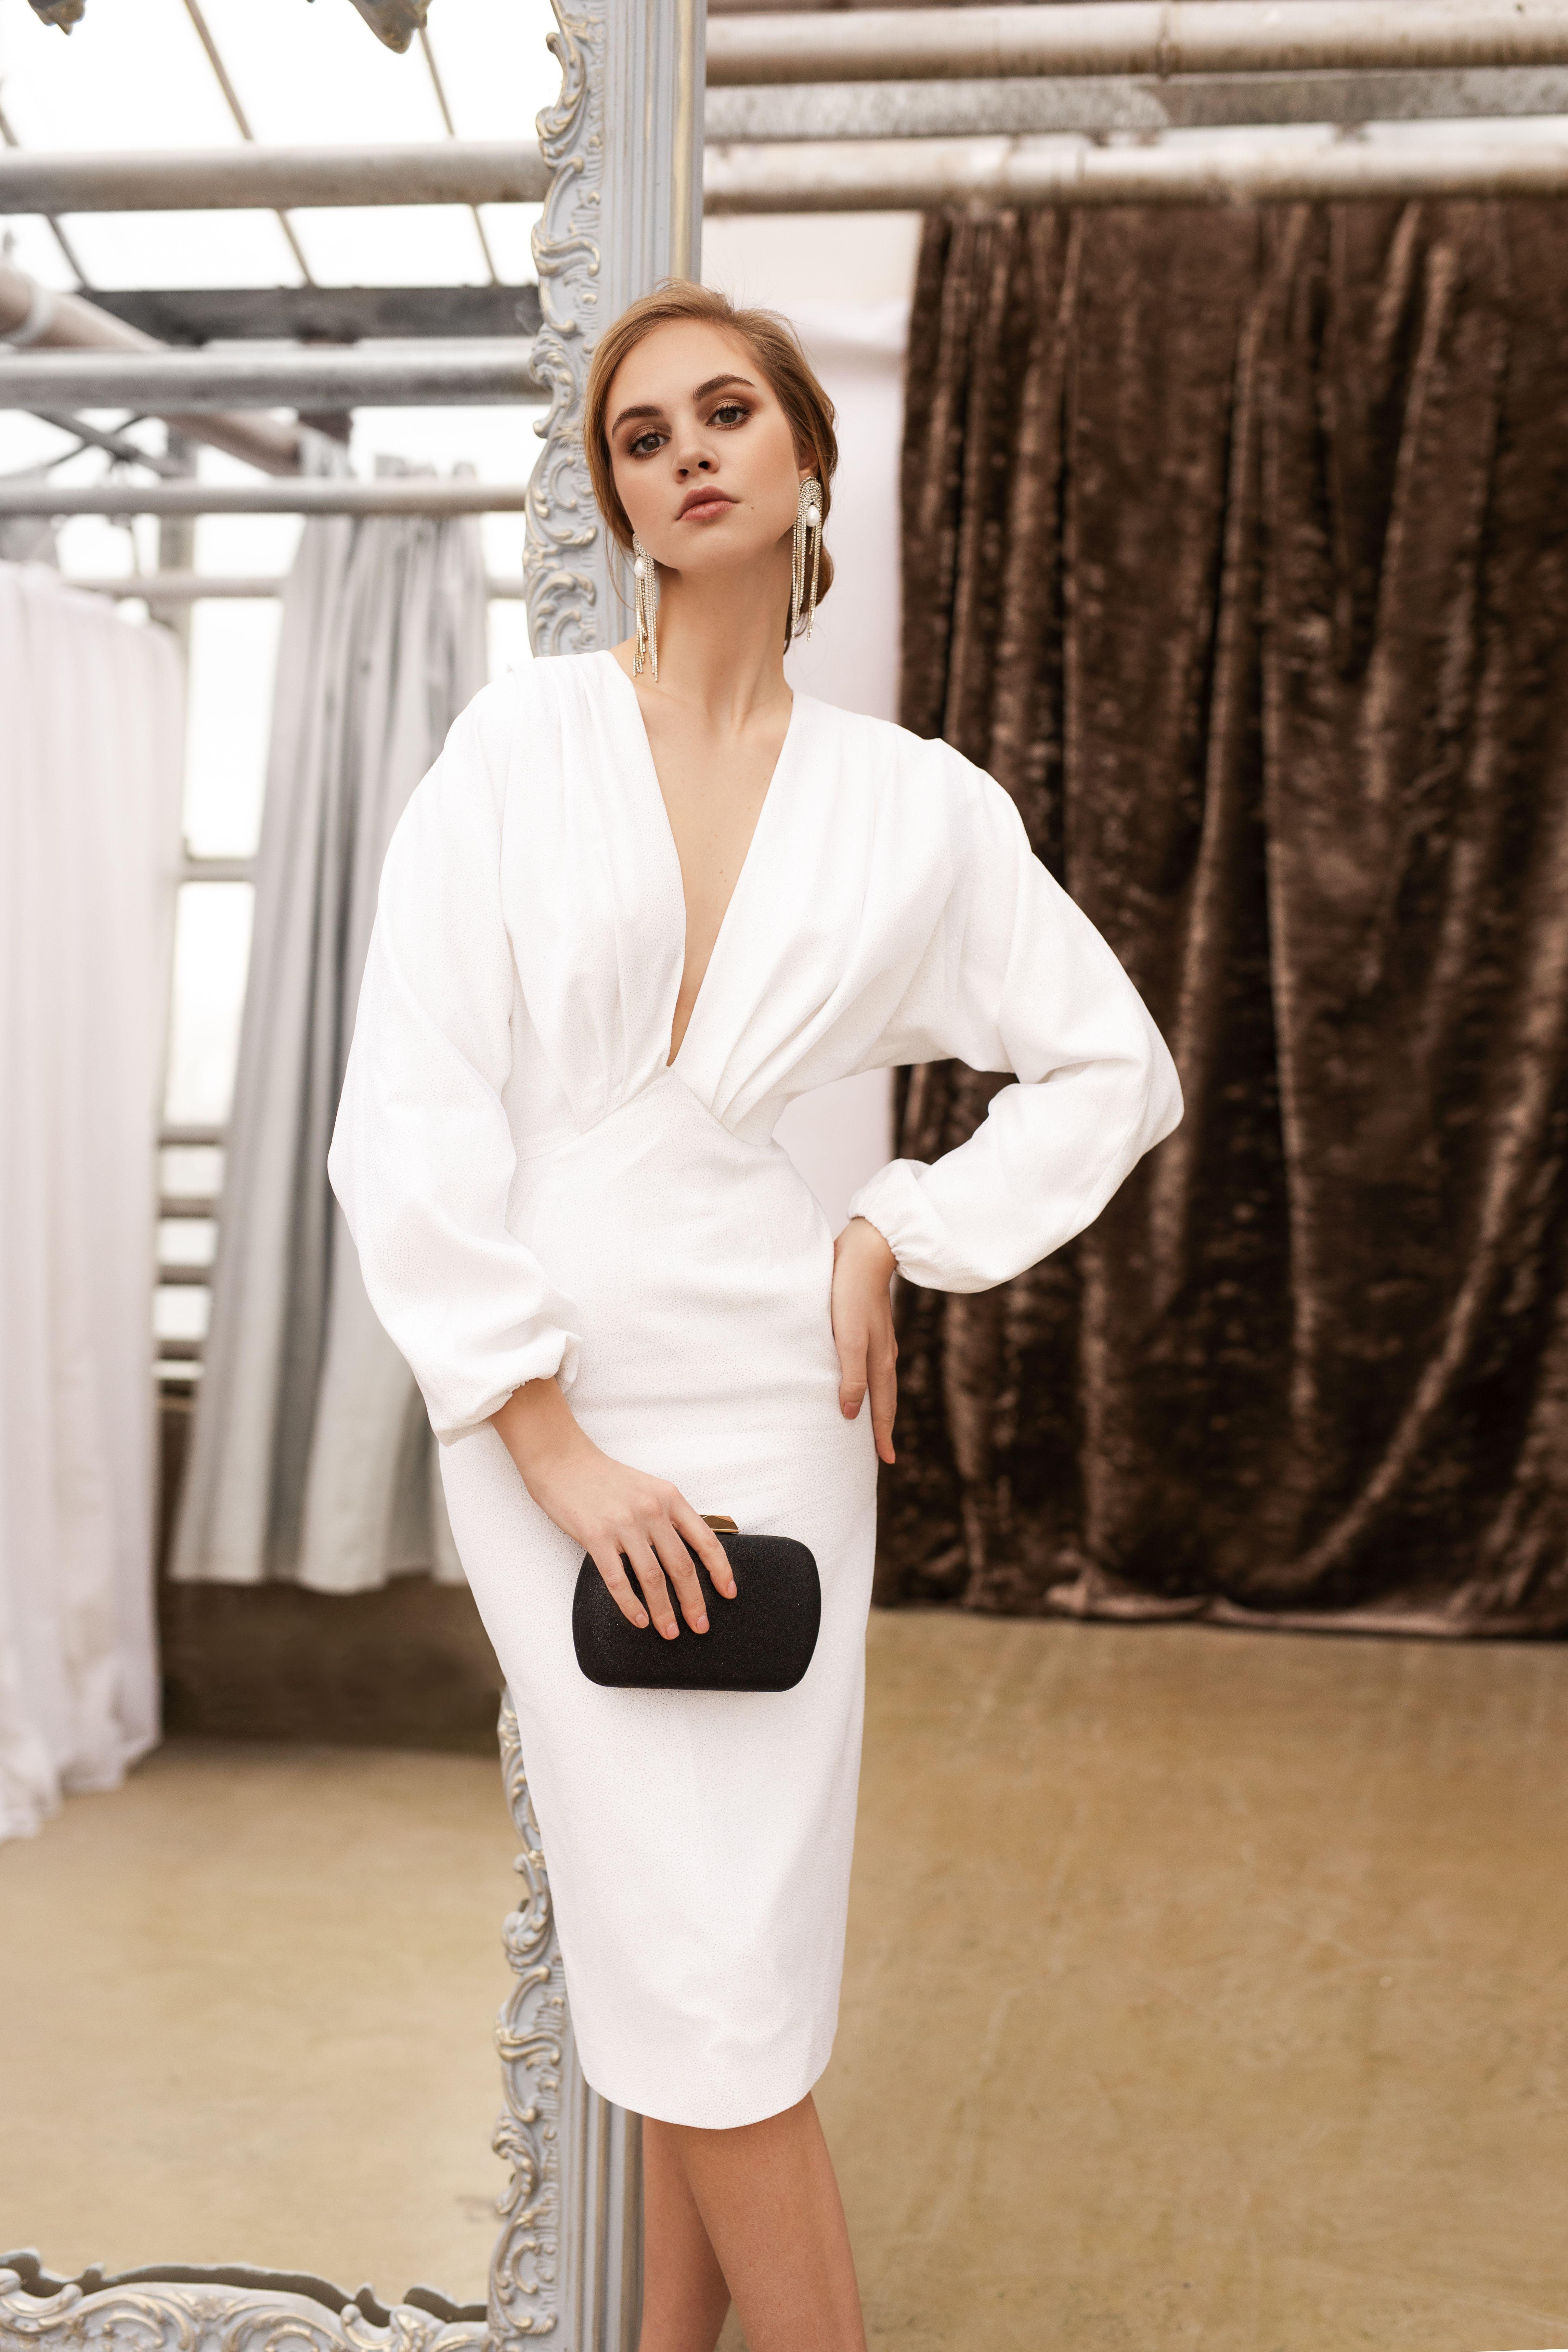 White Sheath Dress Midi Pencil Skirt Wedding Dress Minimalist Simple Bridal Gown V Neck Reception Dress Etsy Wedding Dress Dream Dress Wedding Dress Couture [ 6874 x 4583 Pixel ]